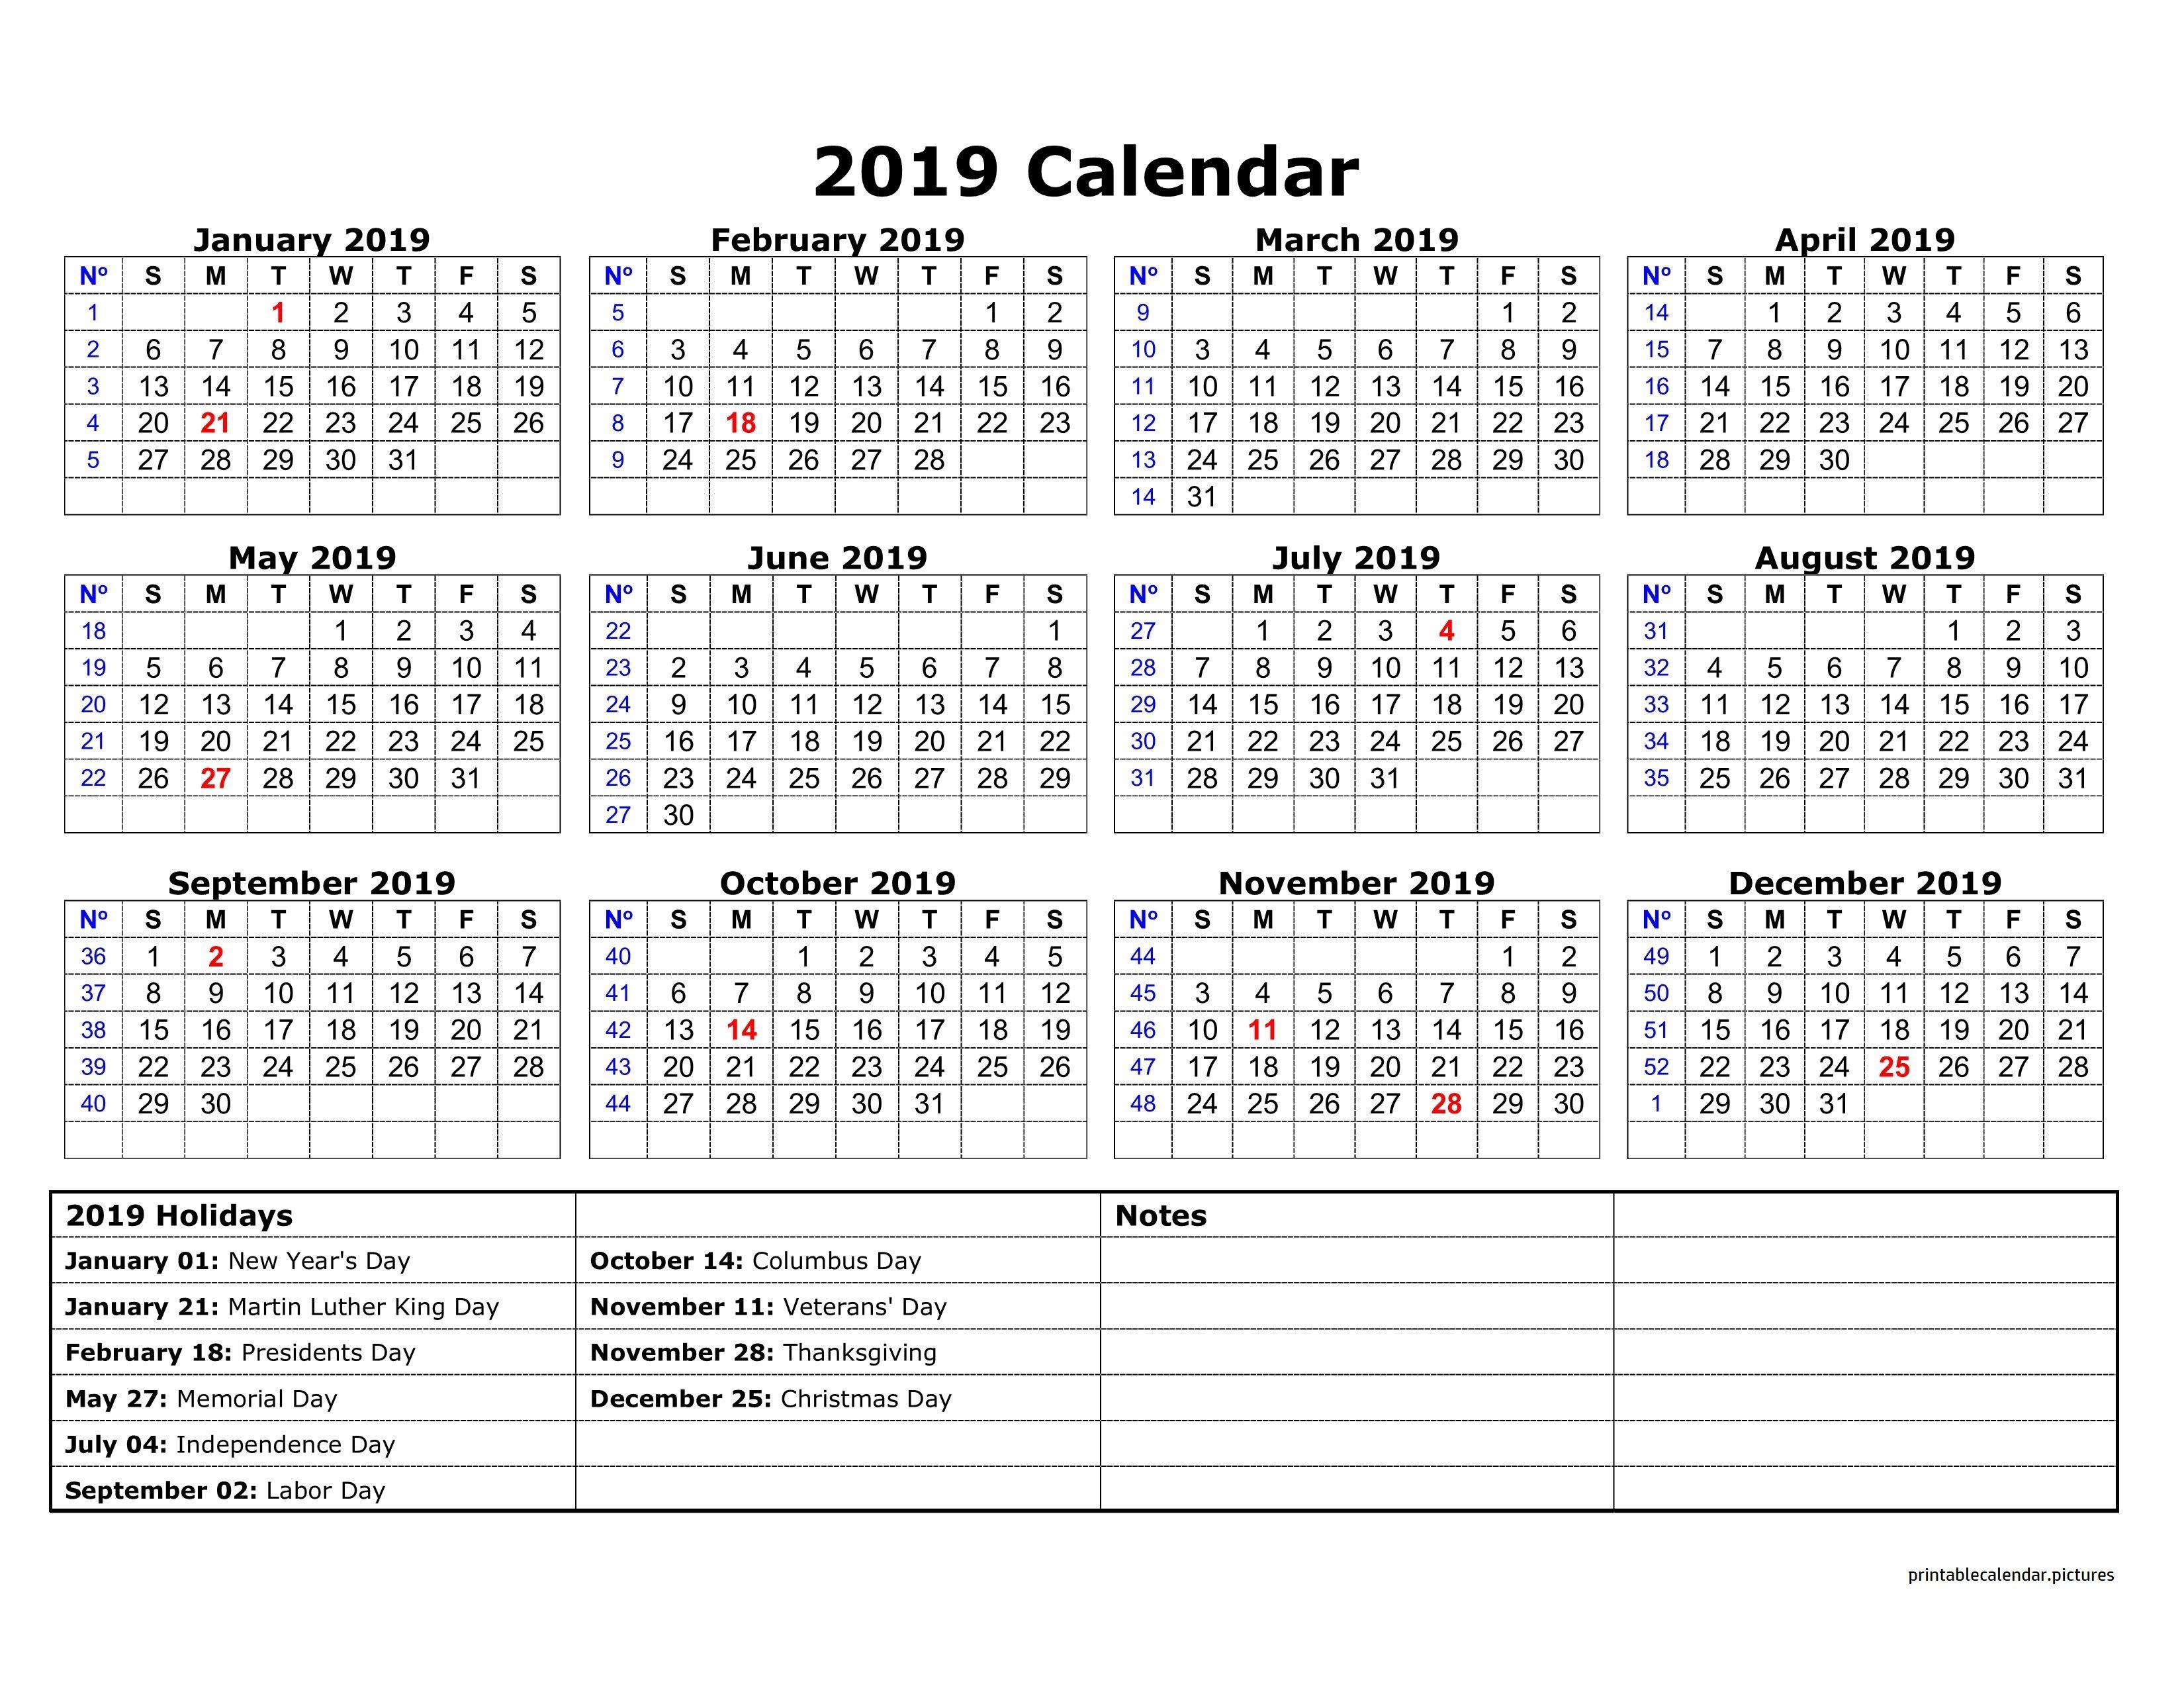 2019 calendar holidays australia